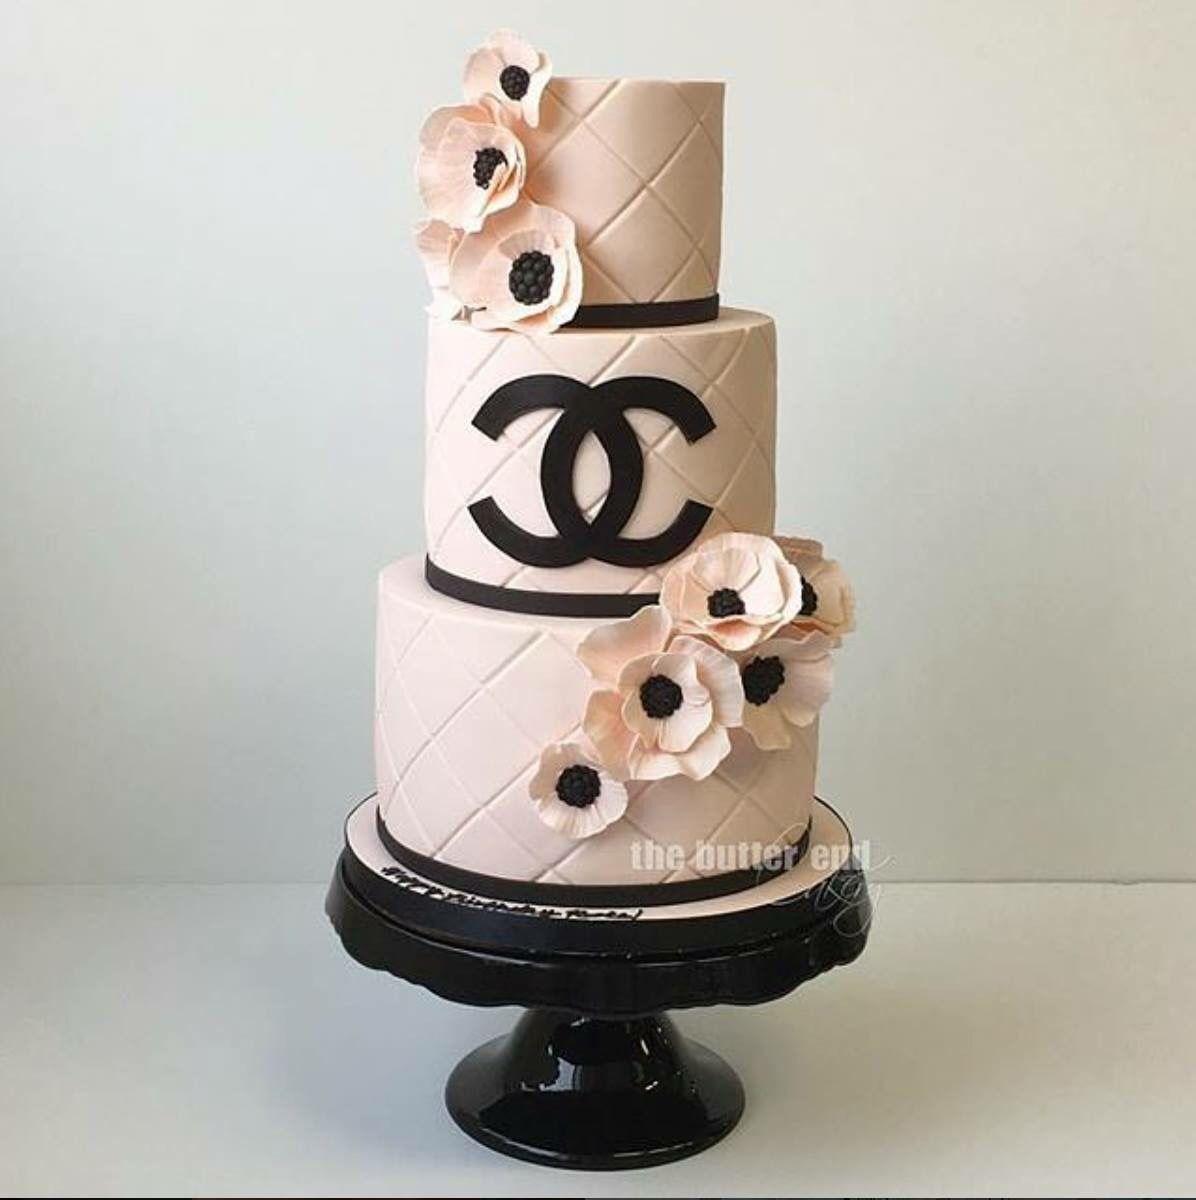 Chanel Cake Designs: Chanel Cake, Cake